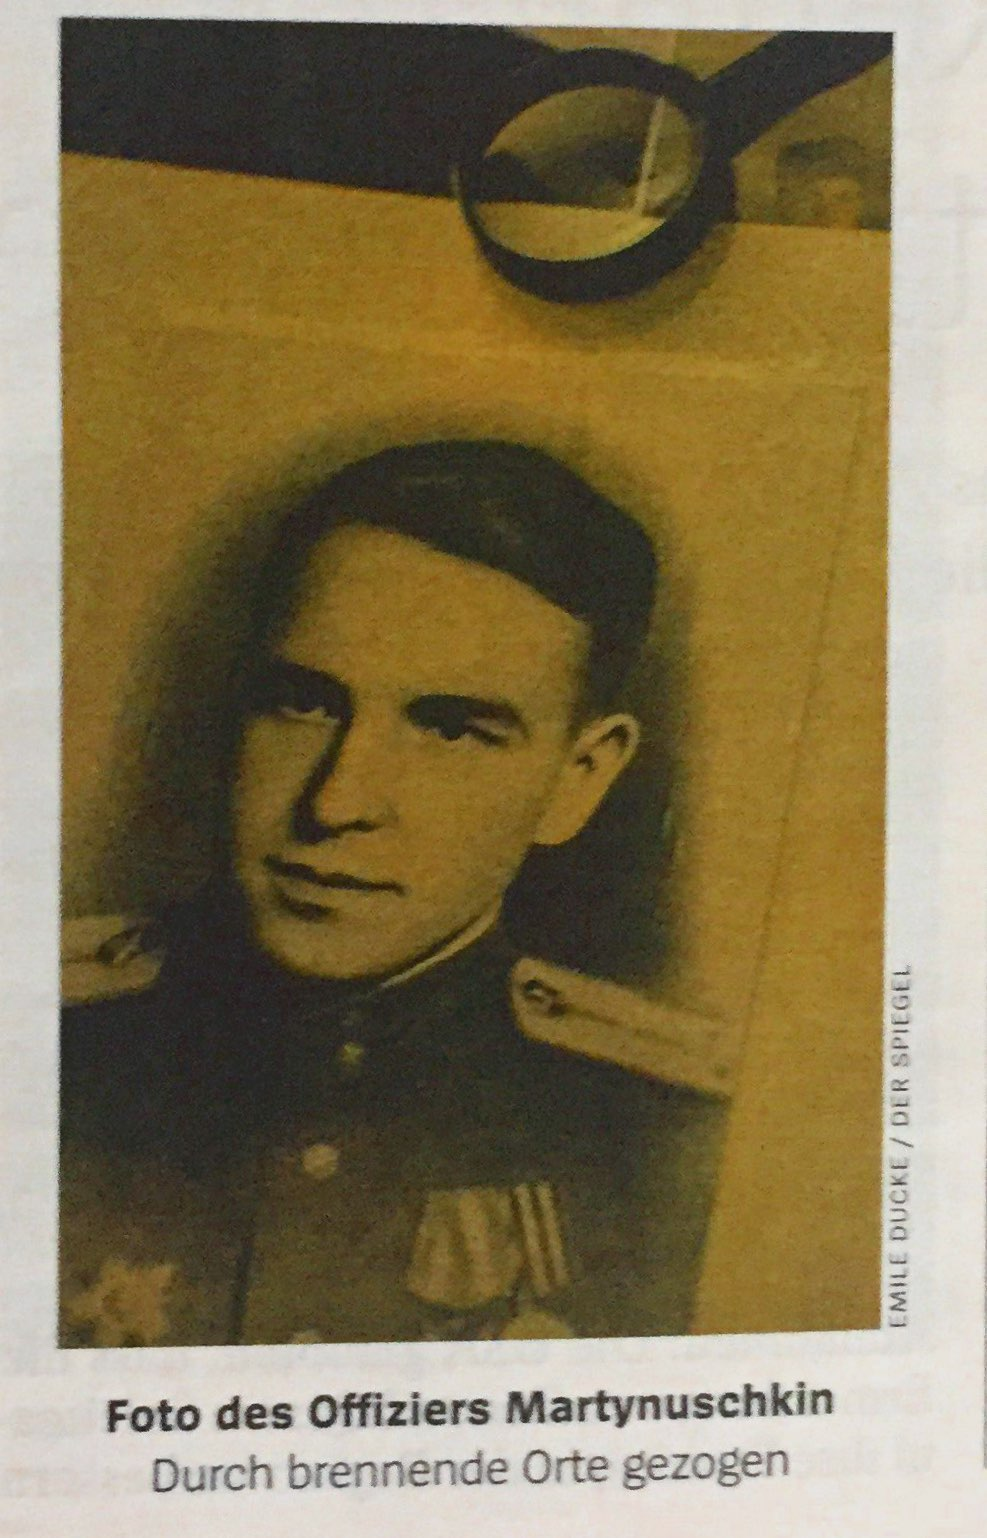 Offizier Martynuschkin